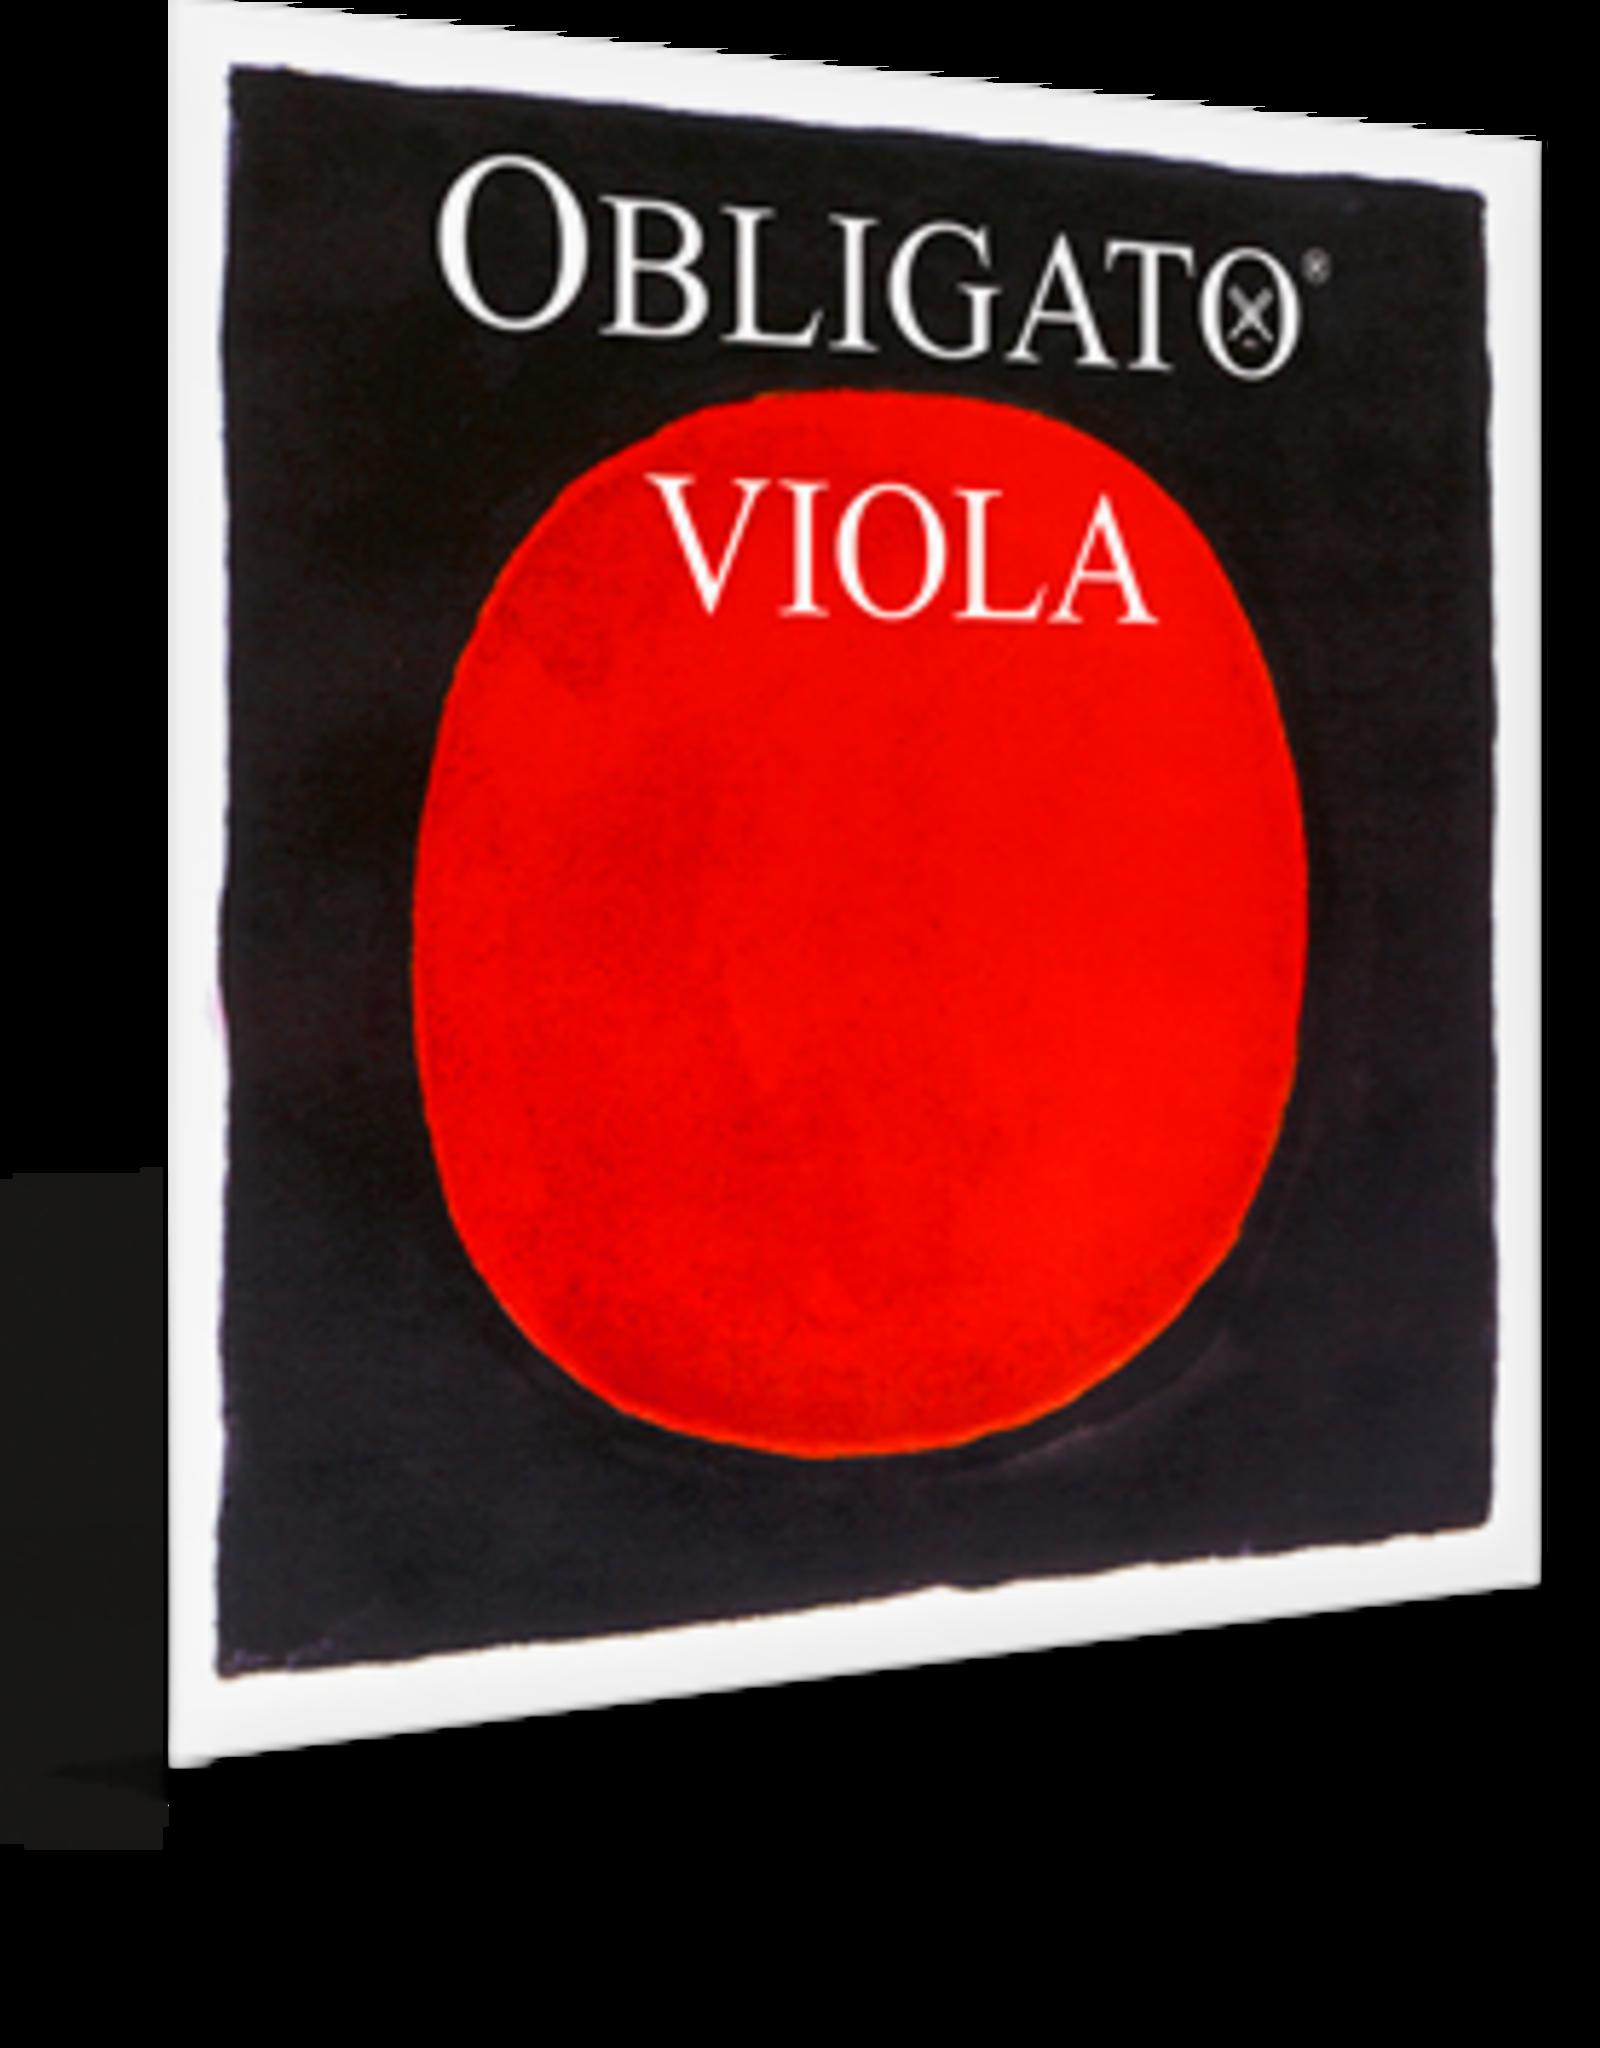 PIRASTRO Viola Obligato A Steel/Aluminum Removable Ball End Mittel Envelope